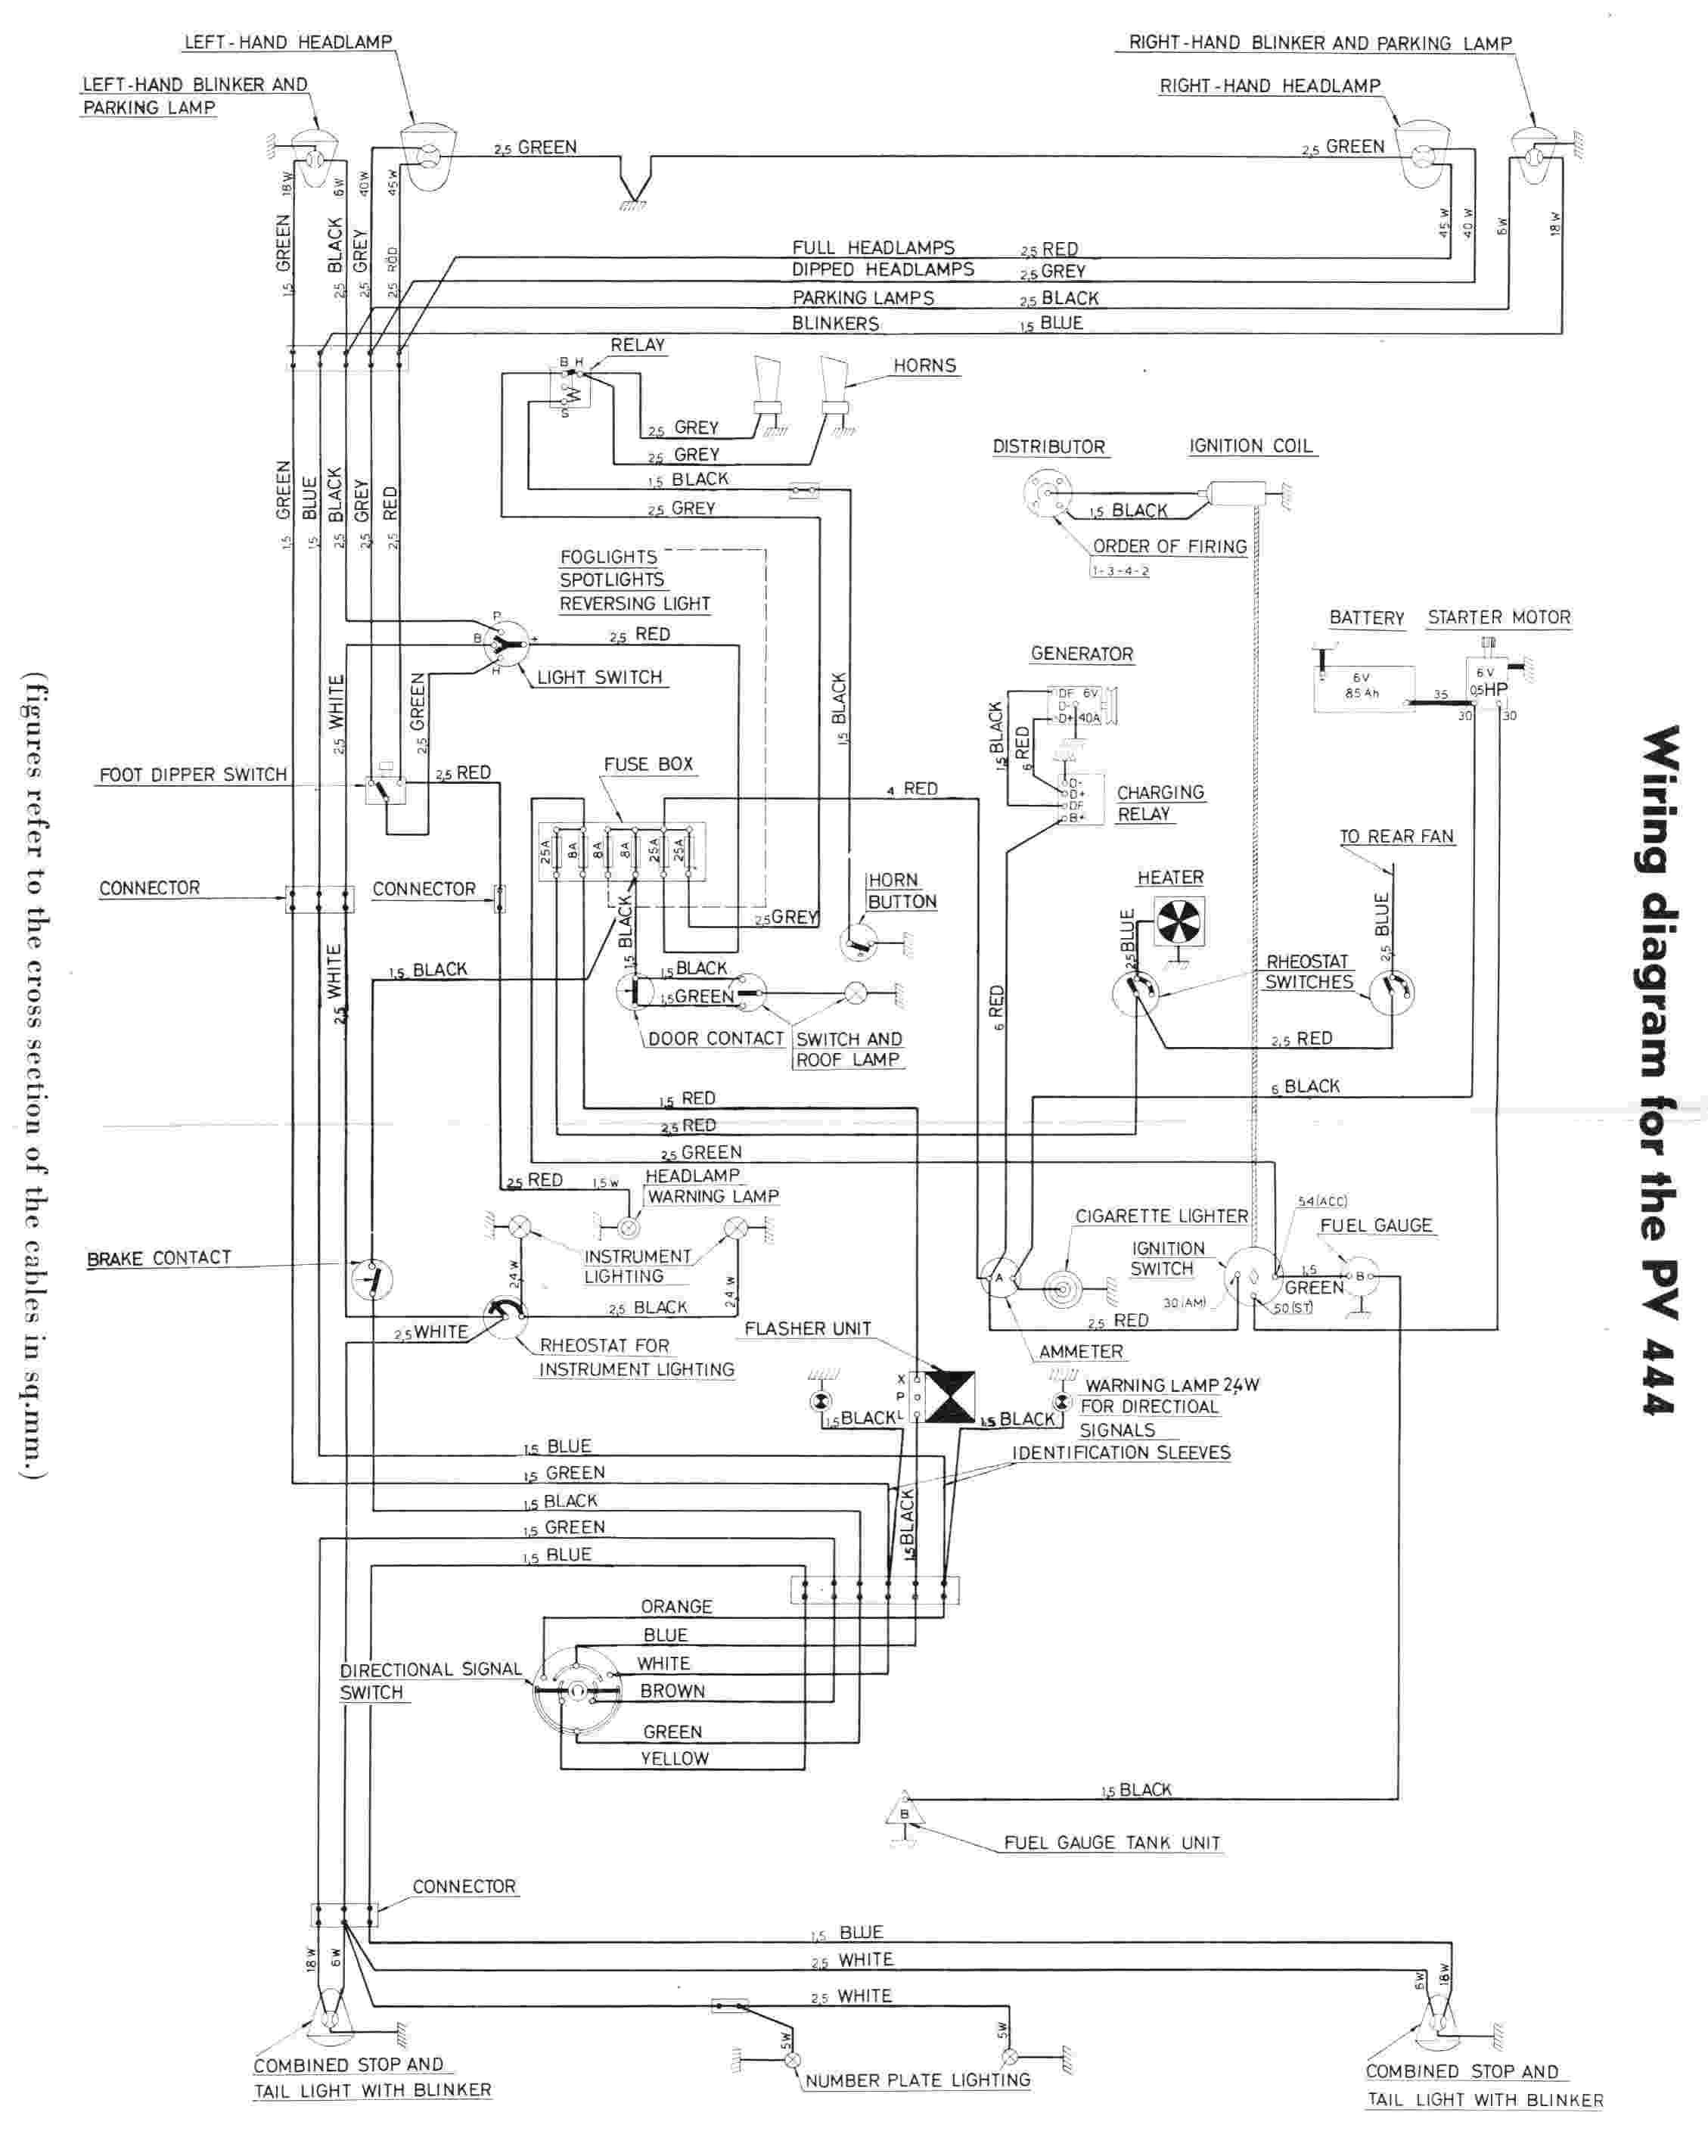 volvo ignition wiring diagram wiring diagram database rh 11 11 1 infection nl de volvo v70 [ 2258 x 2850 Pixel ]